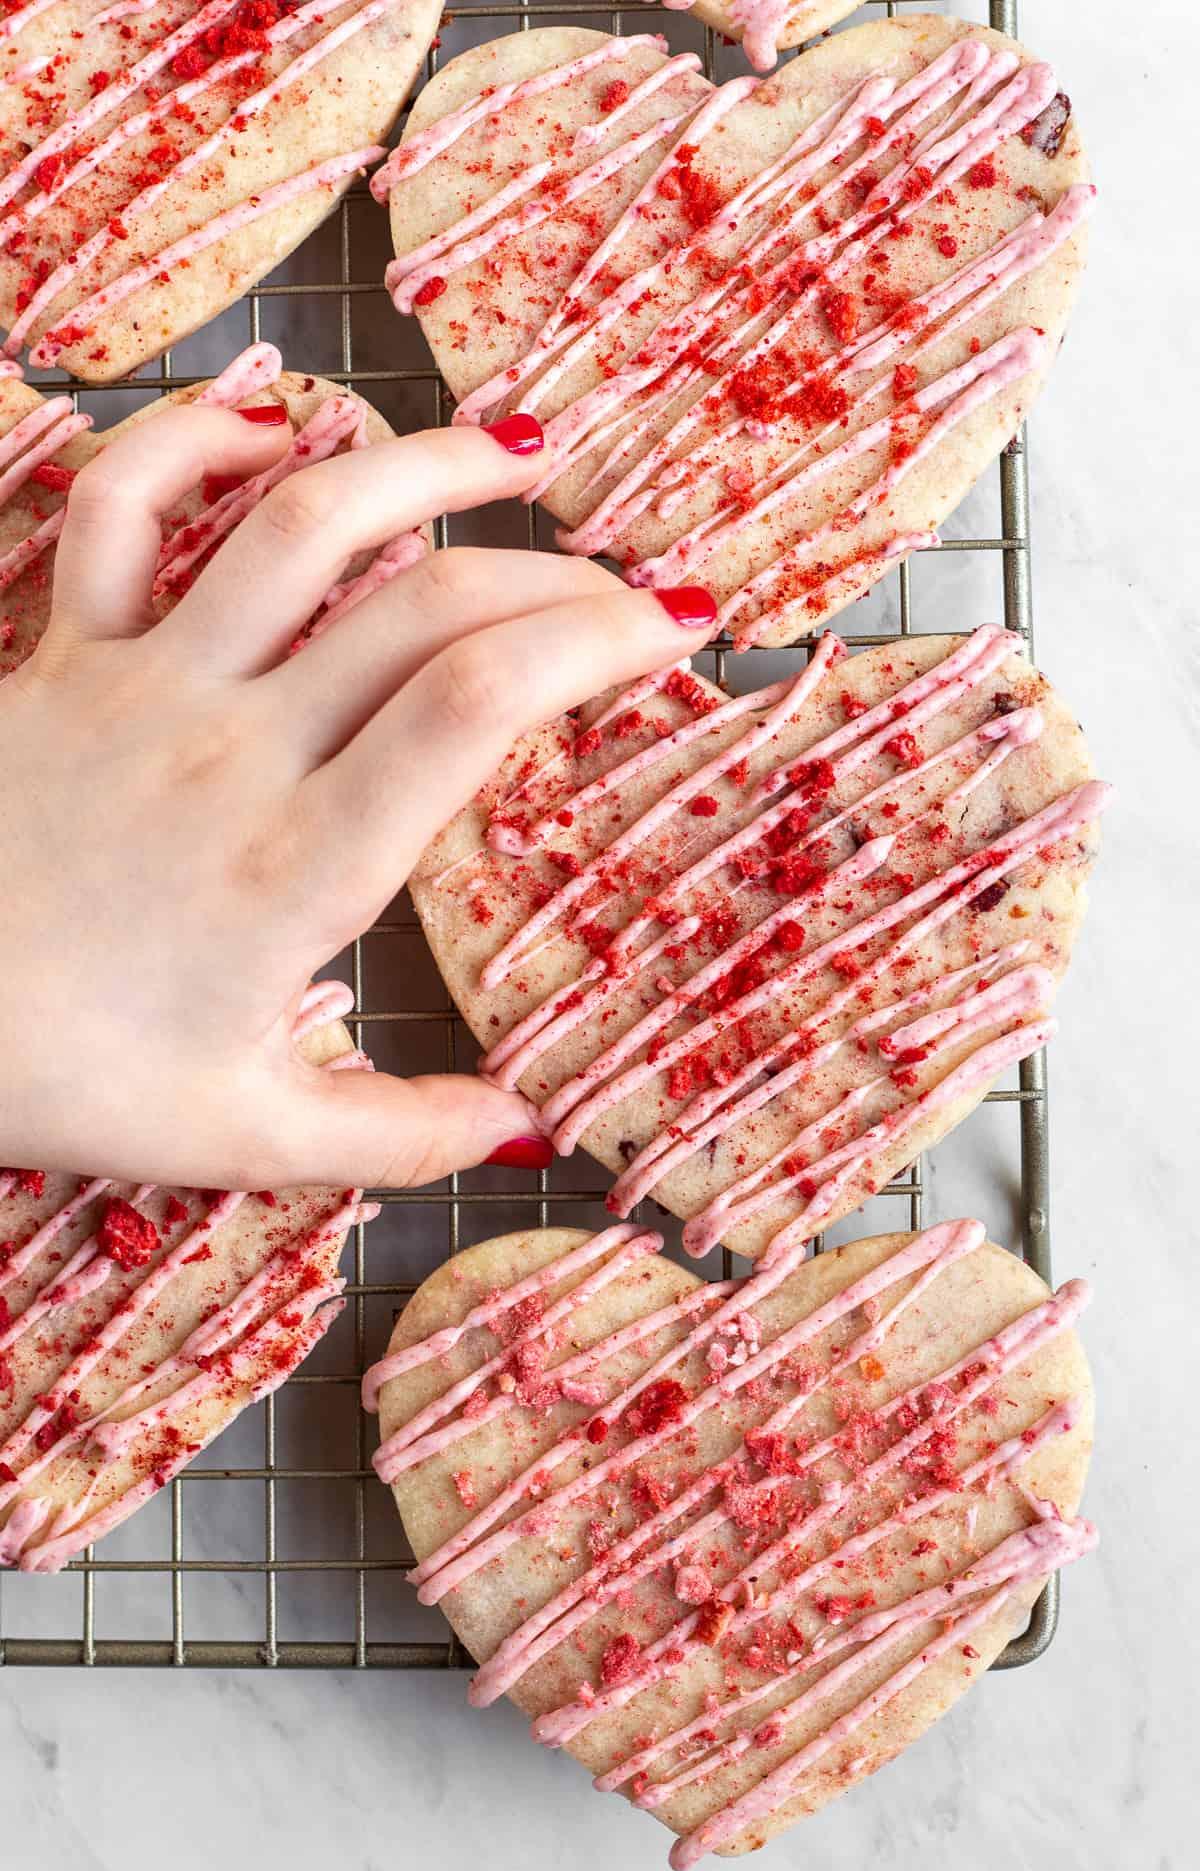 Strawberries and Cream Shortbread Cookies